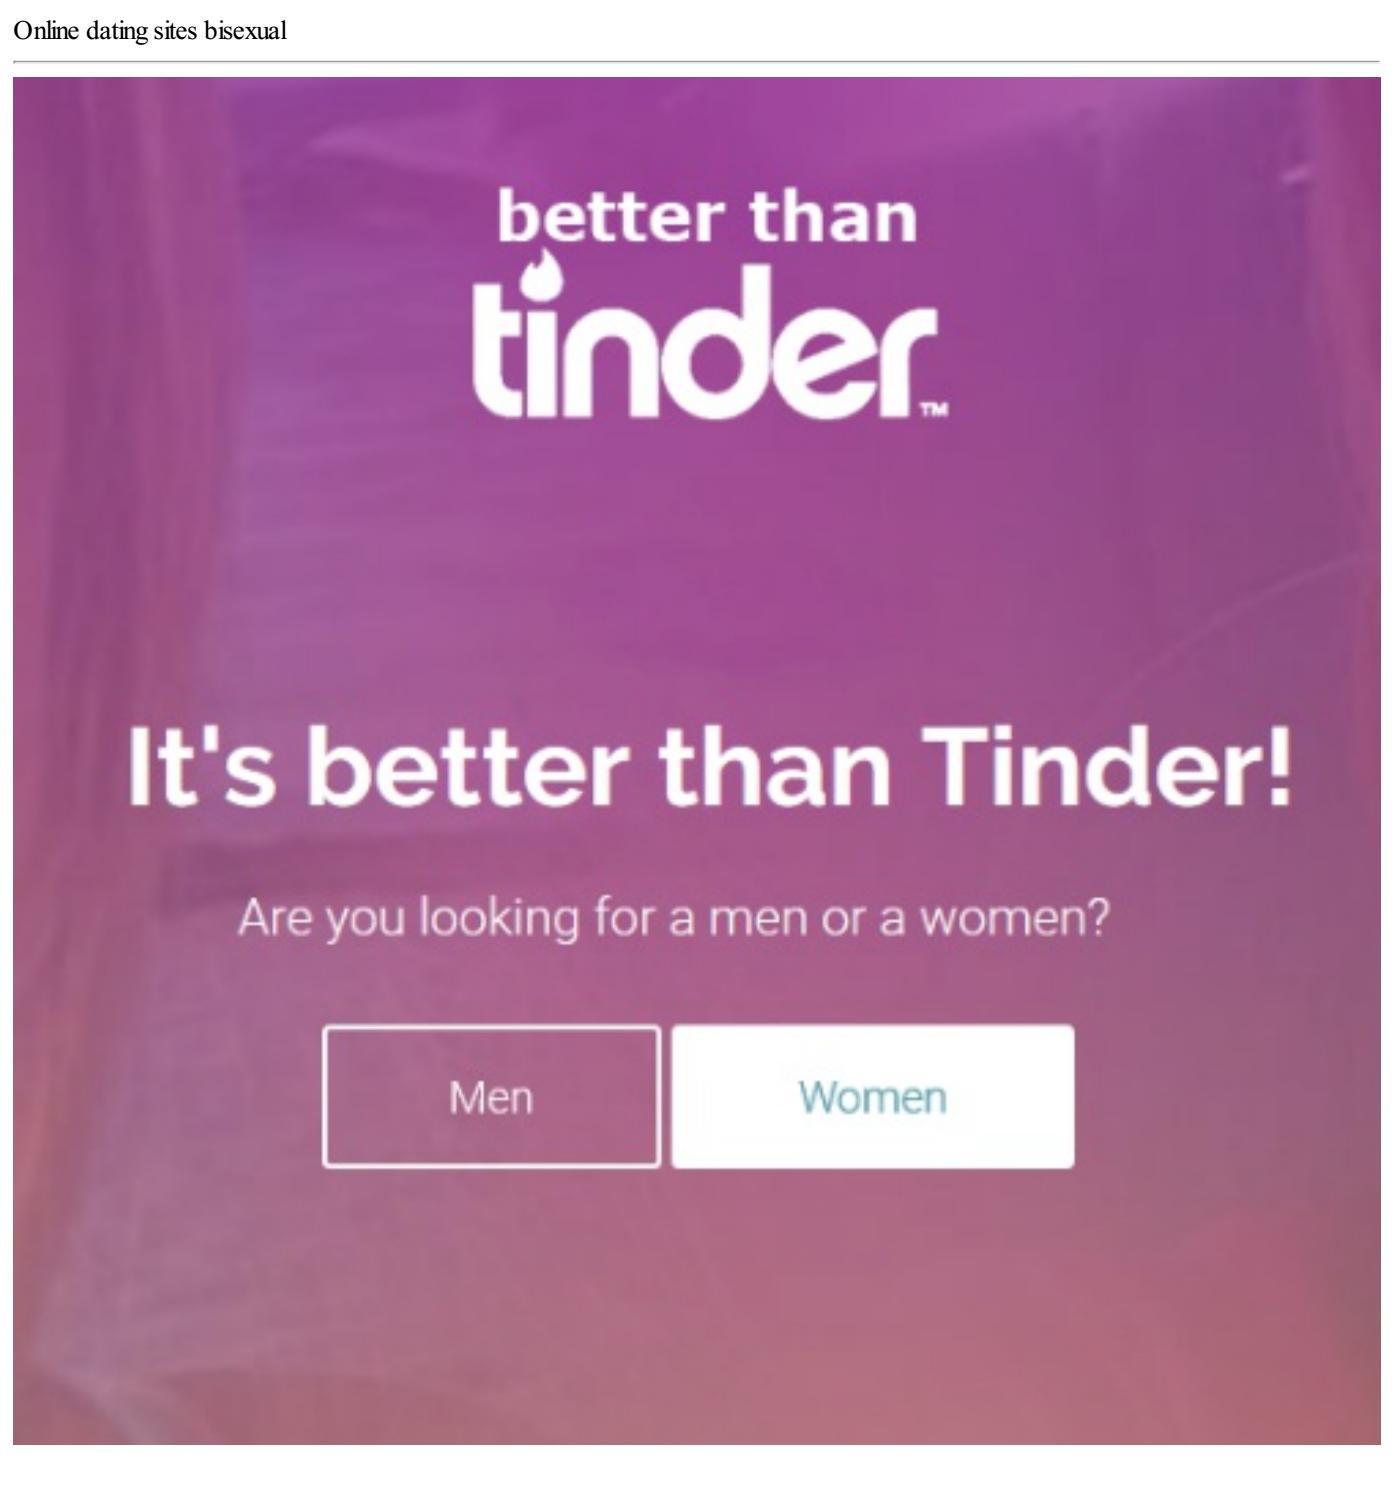 bi sexual online dating sites